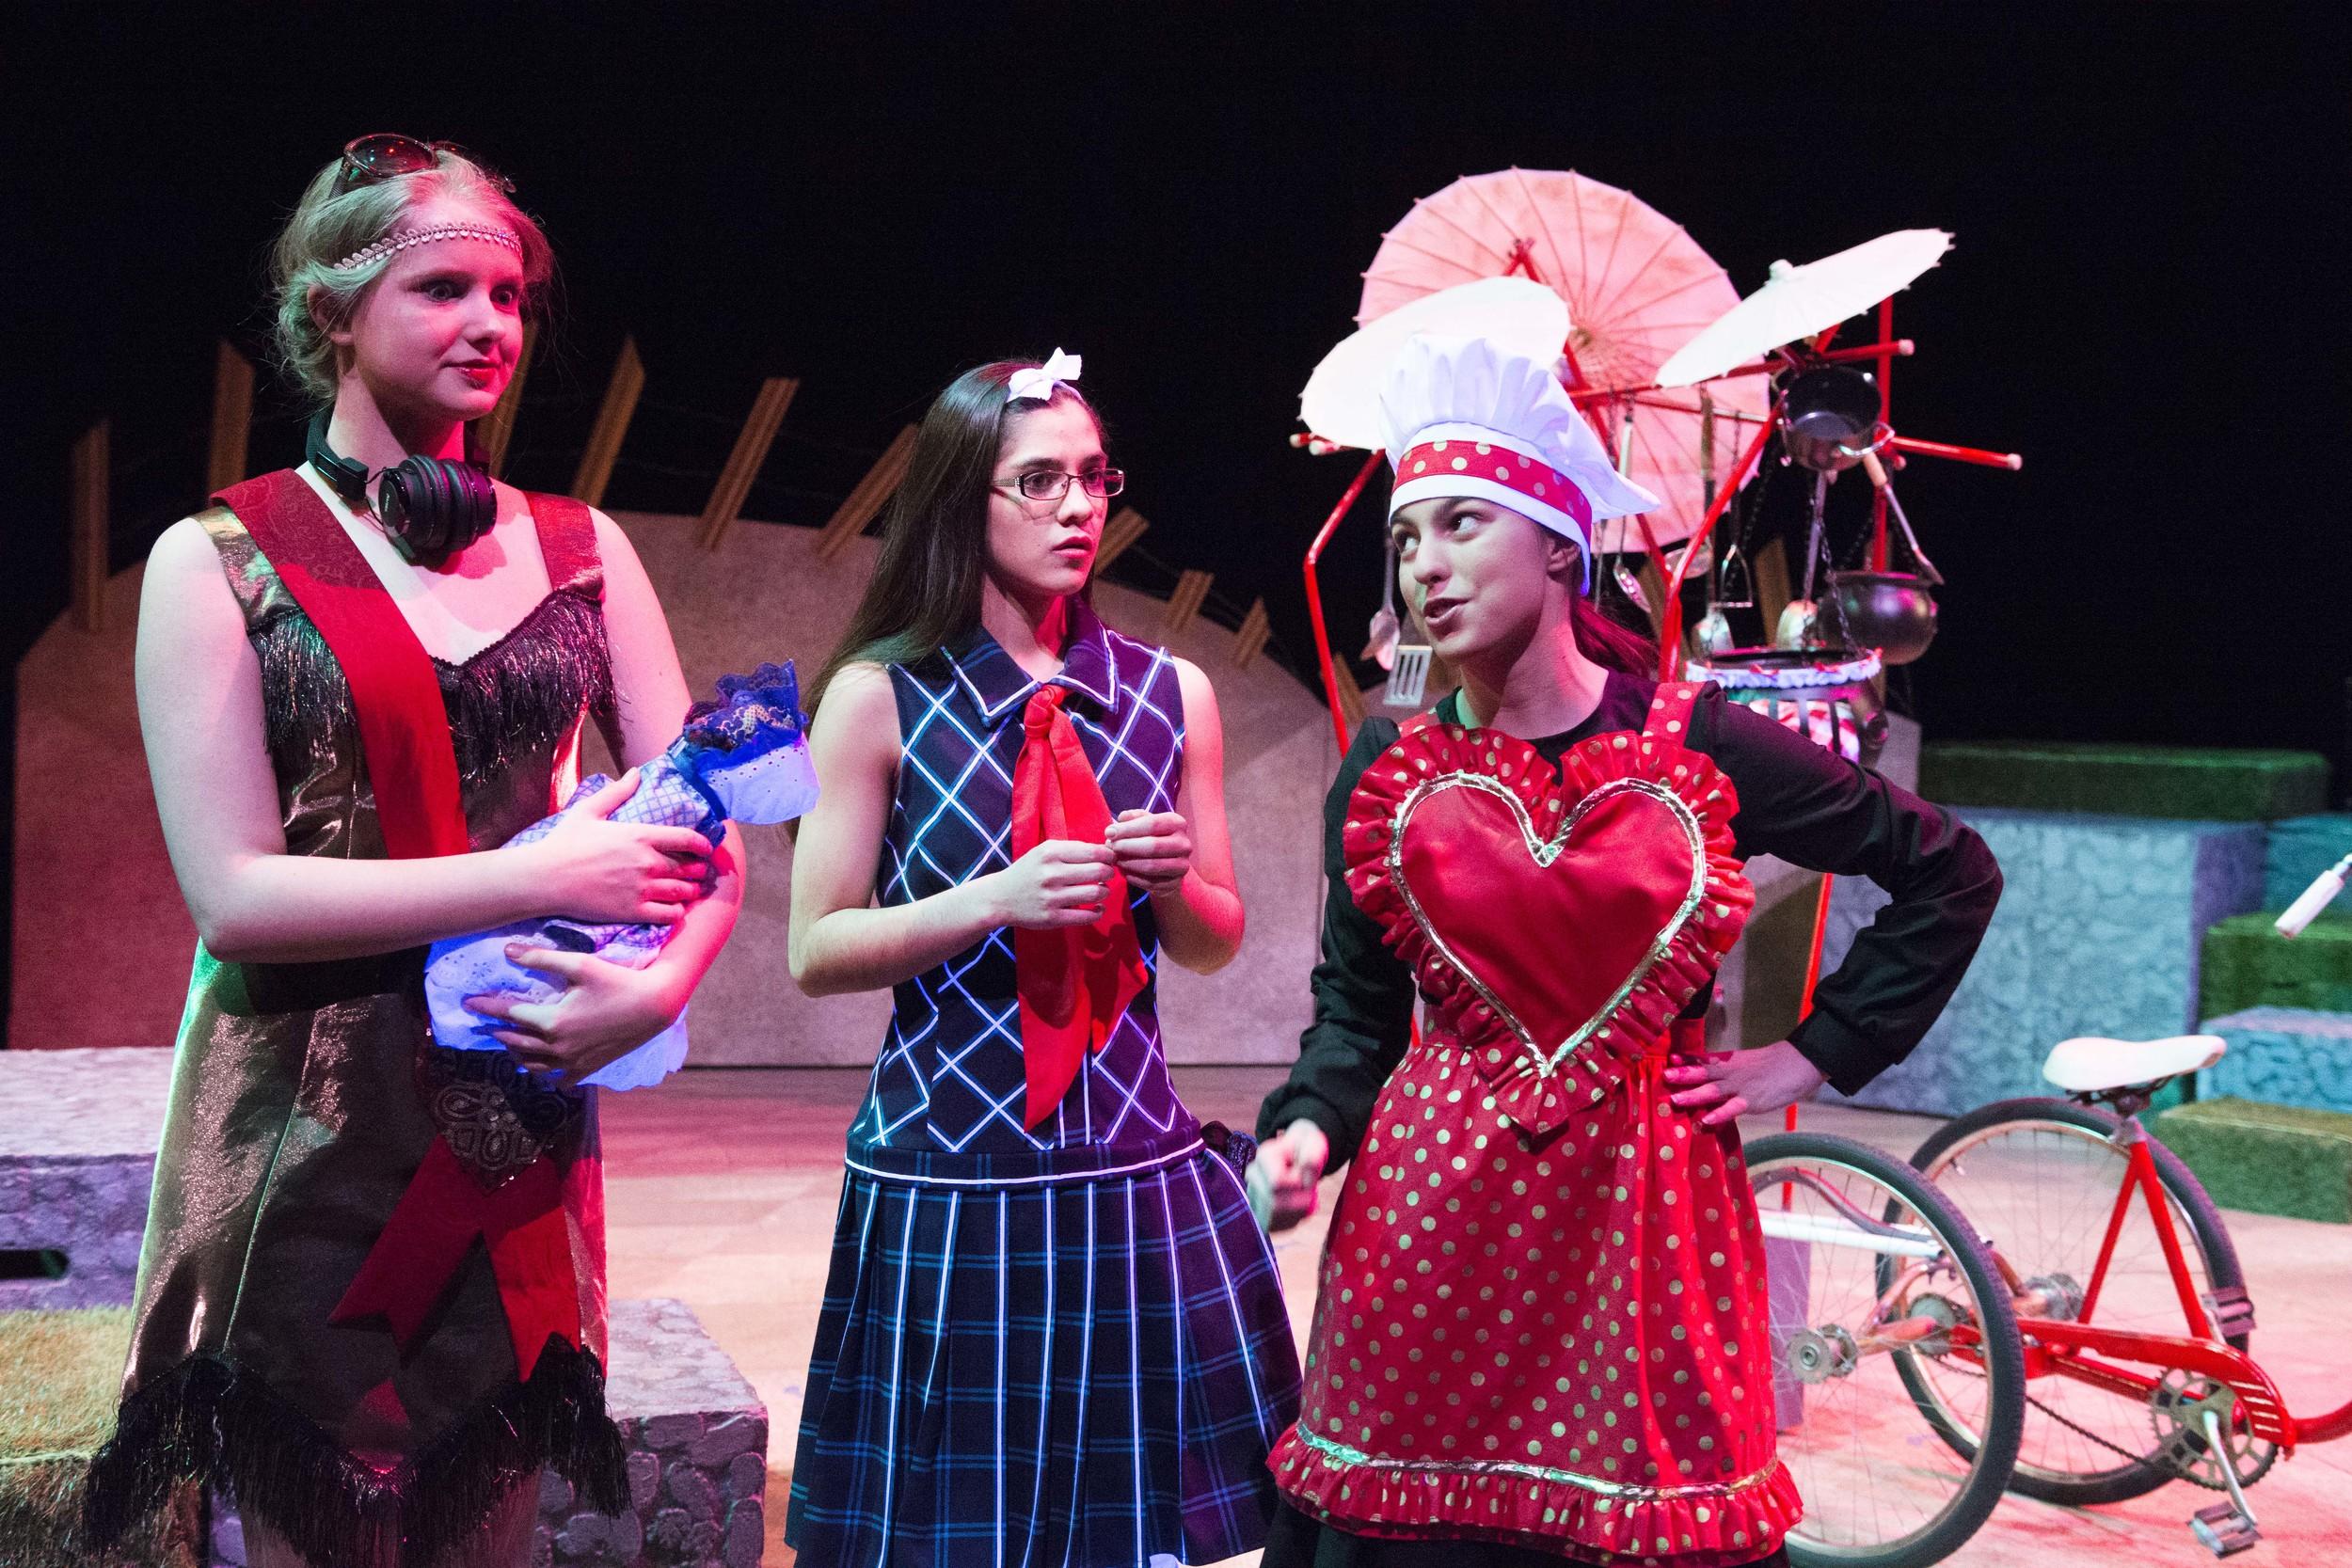 Callie Dochterman (The Dutchess, left), Carlie Campos Ott (Alice, center) and Aidan Hefner (Cook, right) meet along Alice's way through Wonderland.